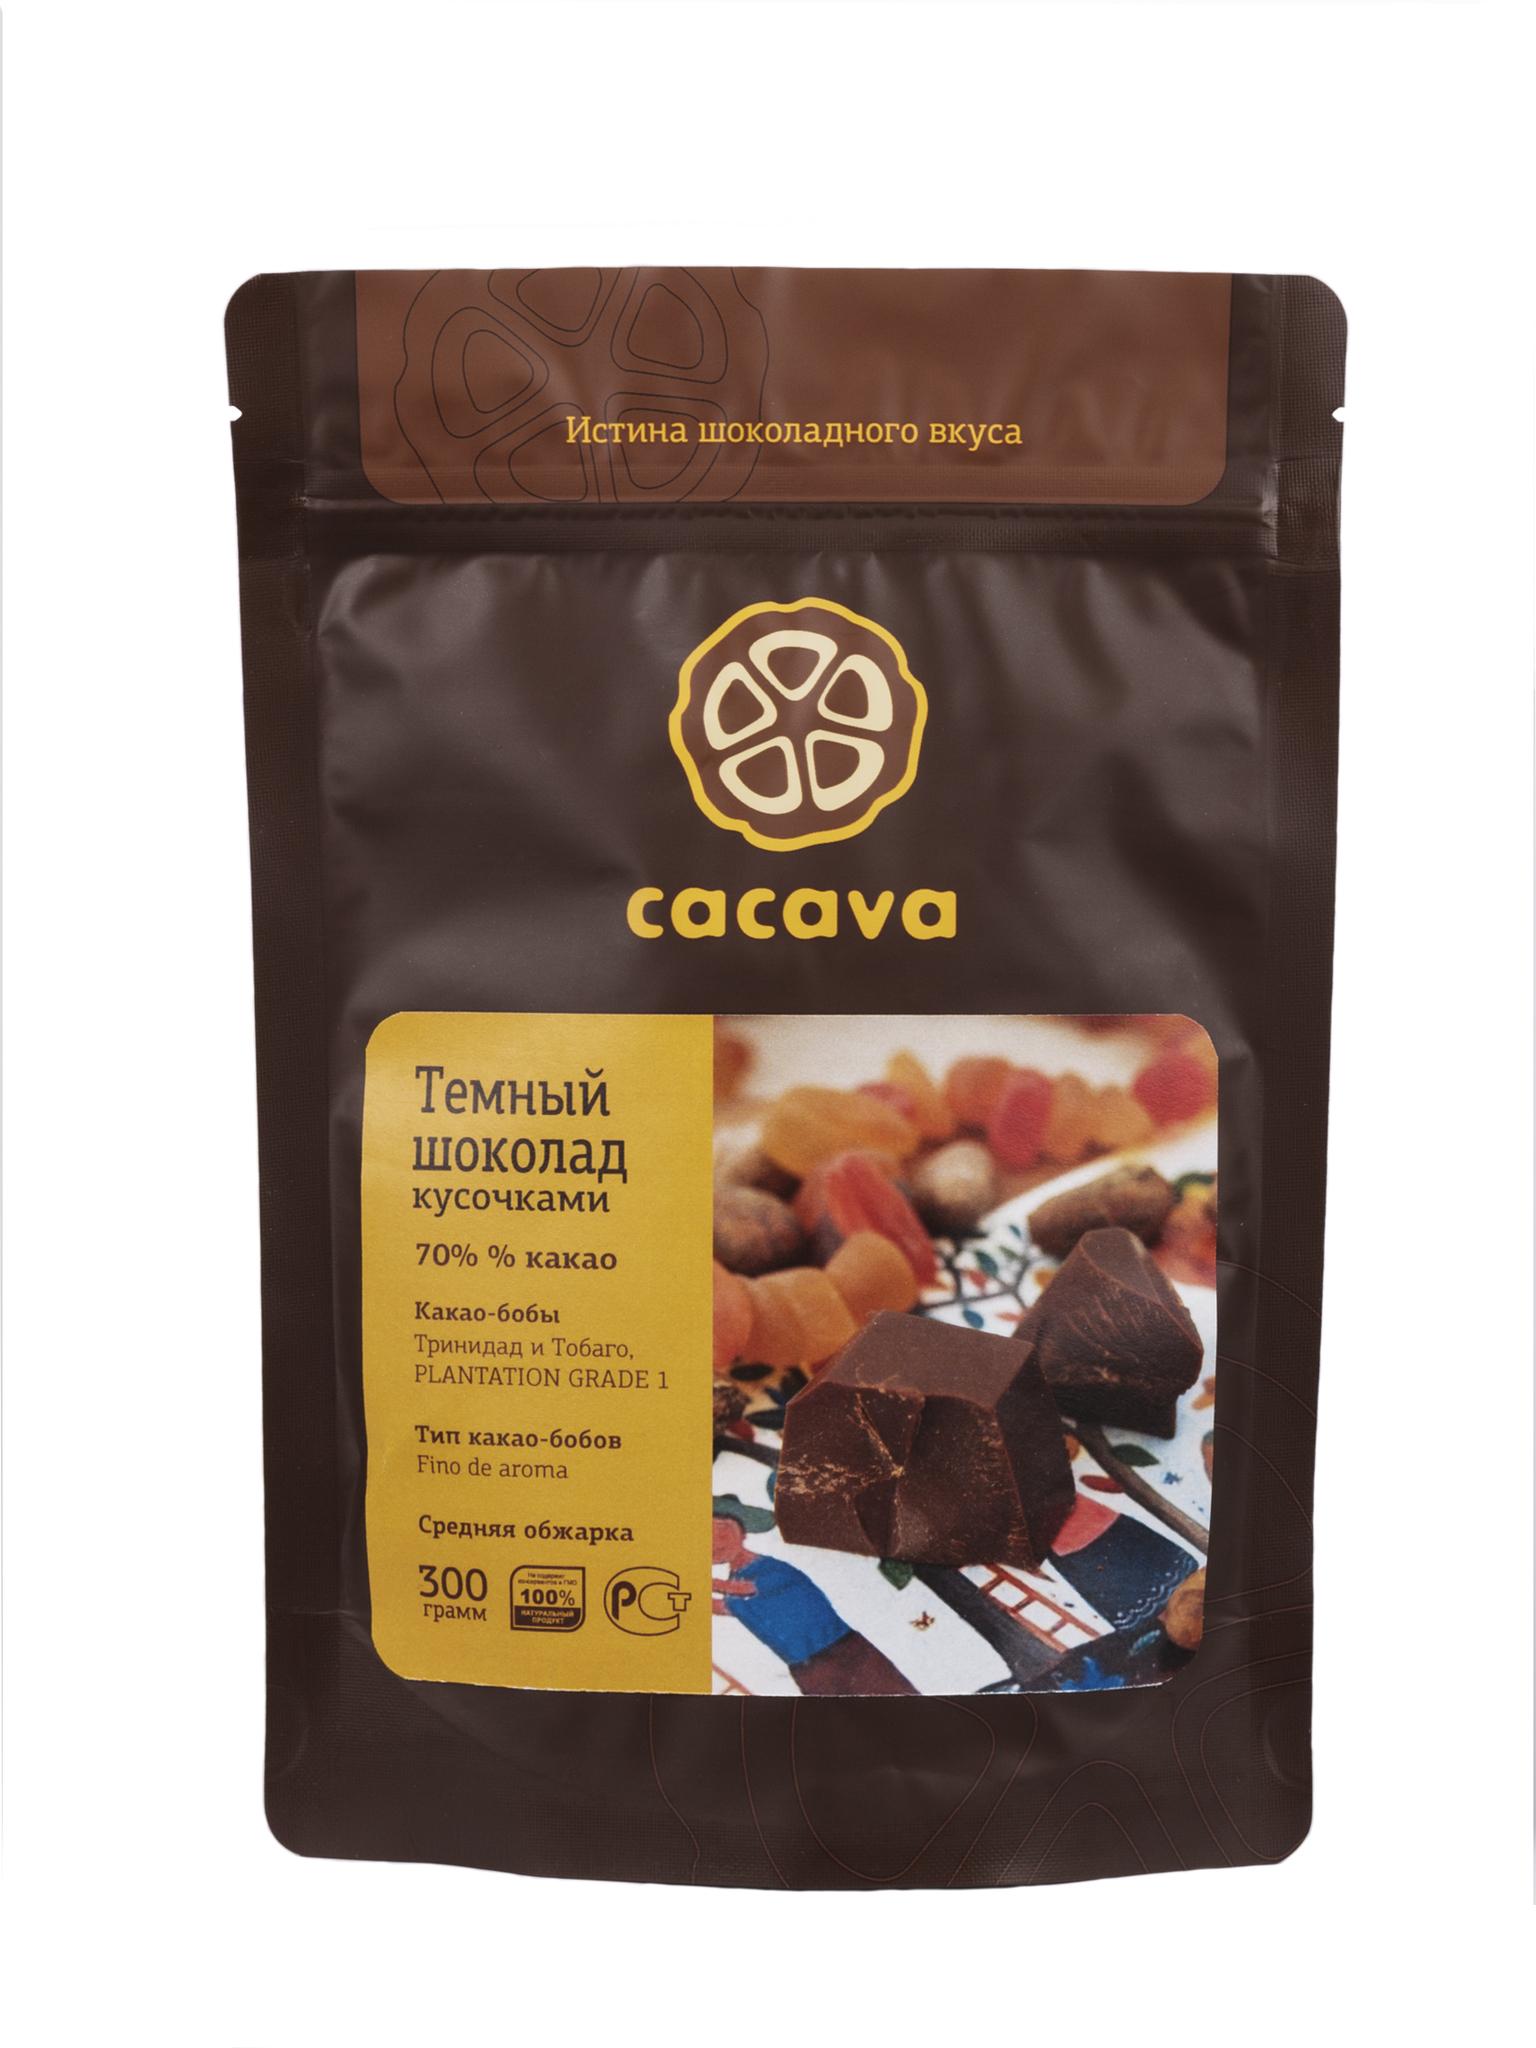 Тёмный шоколад 70% какао (Тринидад), упаковка 300 грамм